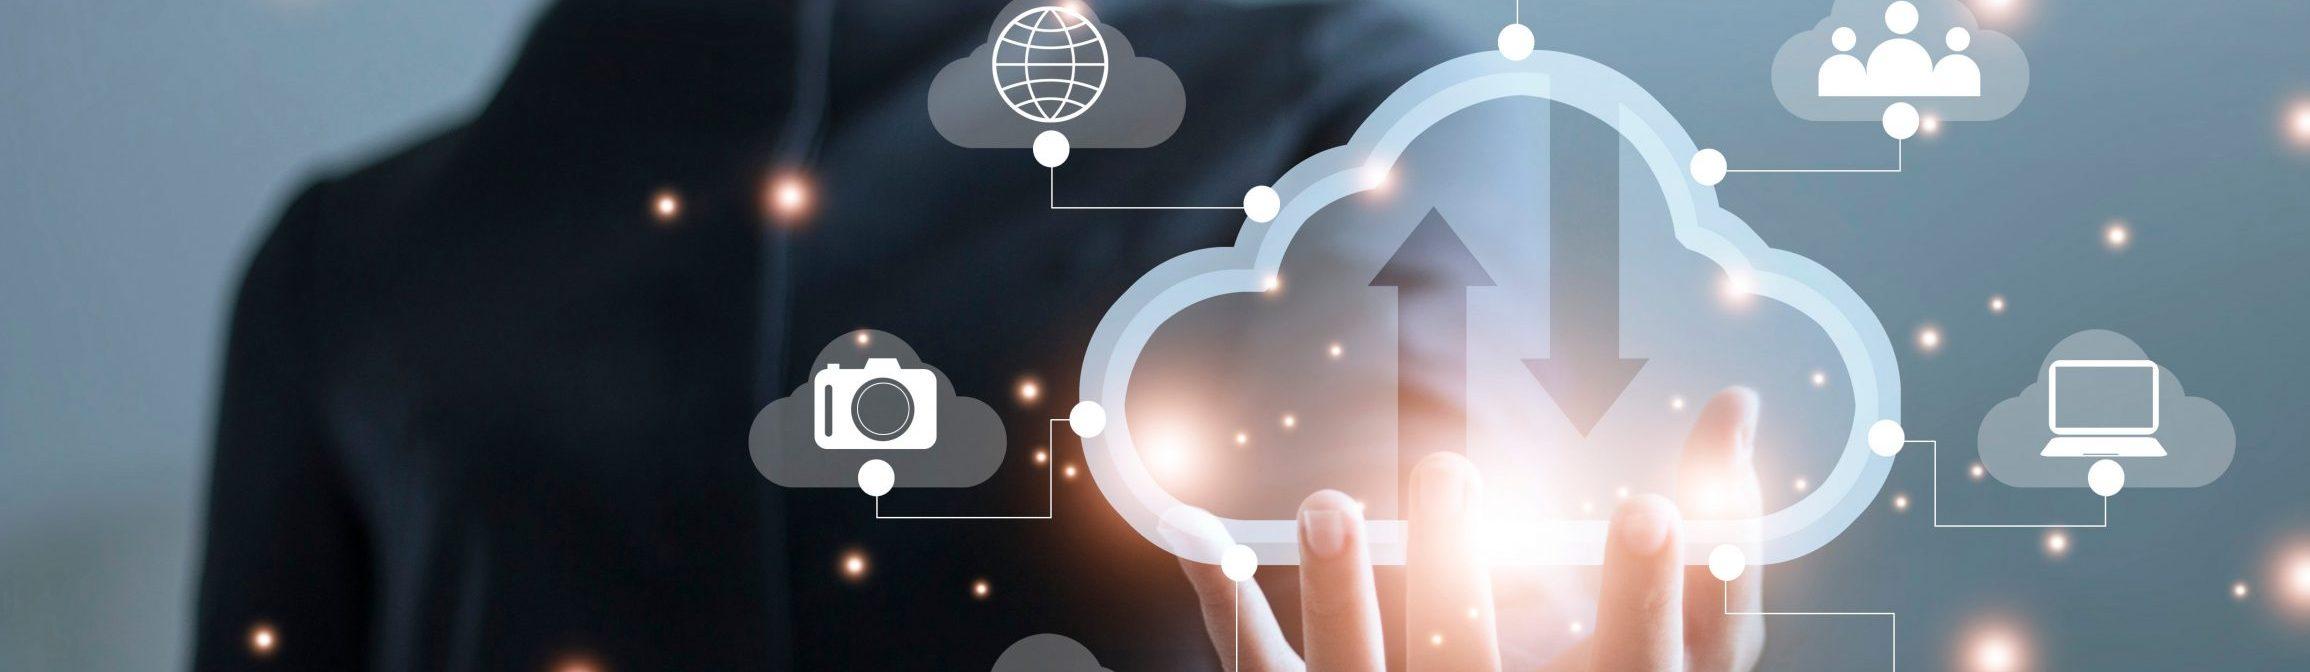 Cloud Computing Auckland